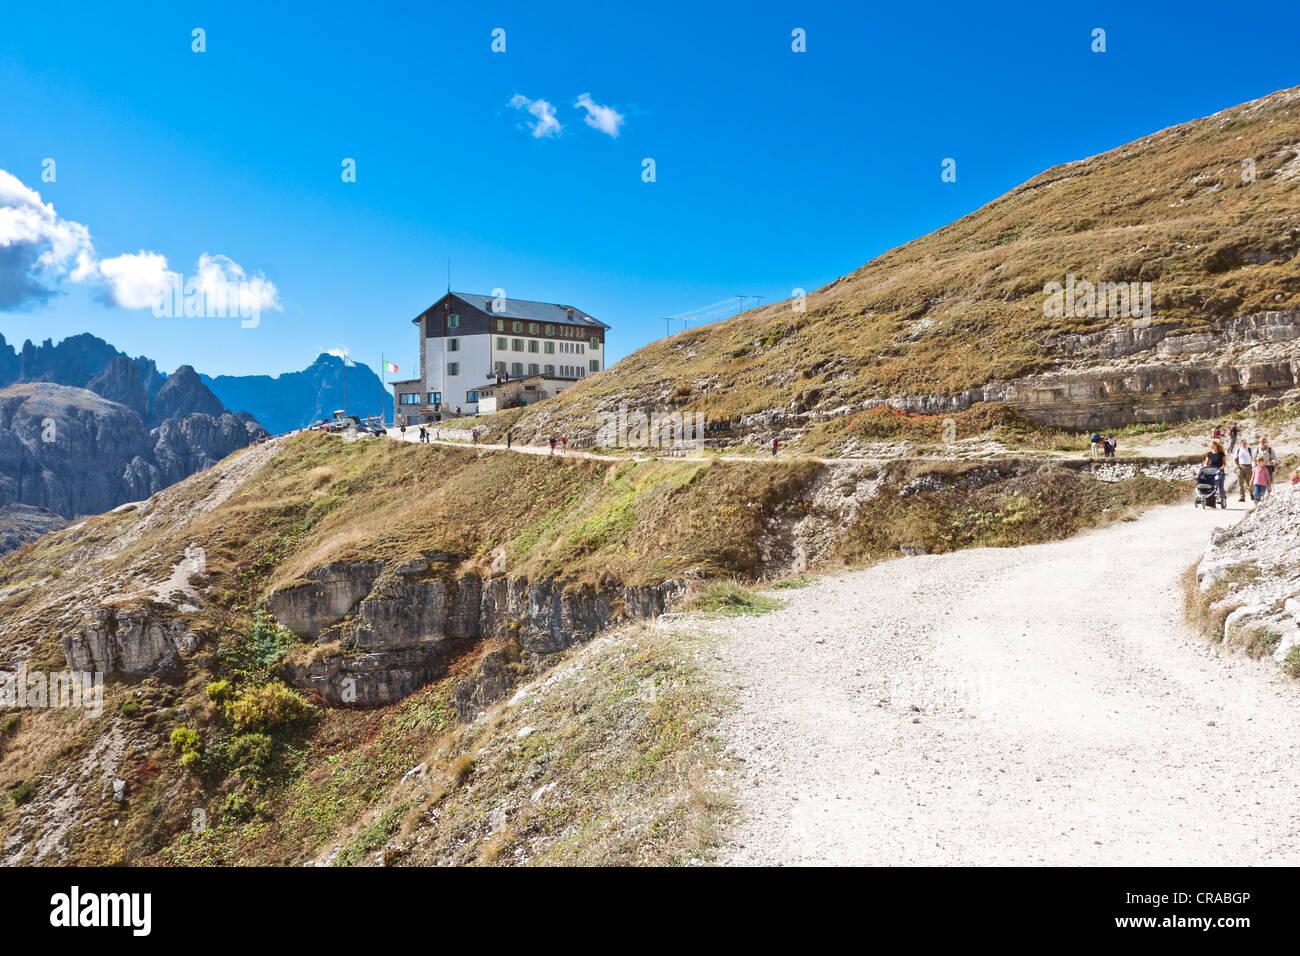 Auronzo Refuge, Three Peaks hiking trail, Alta Pusteria, Dolomites of Sesto, Italy, Europe Stock Photo